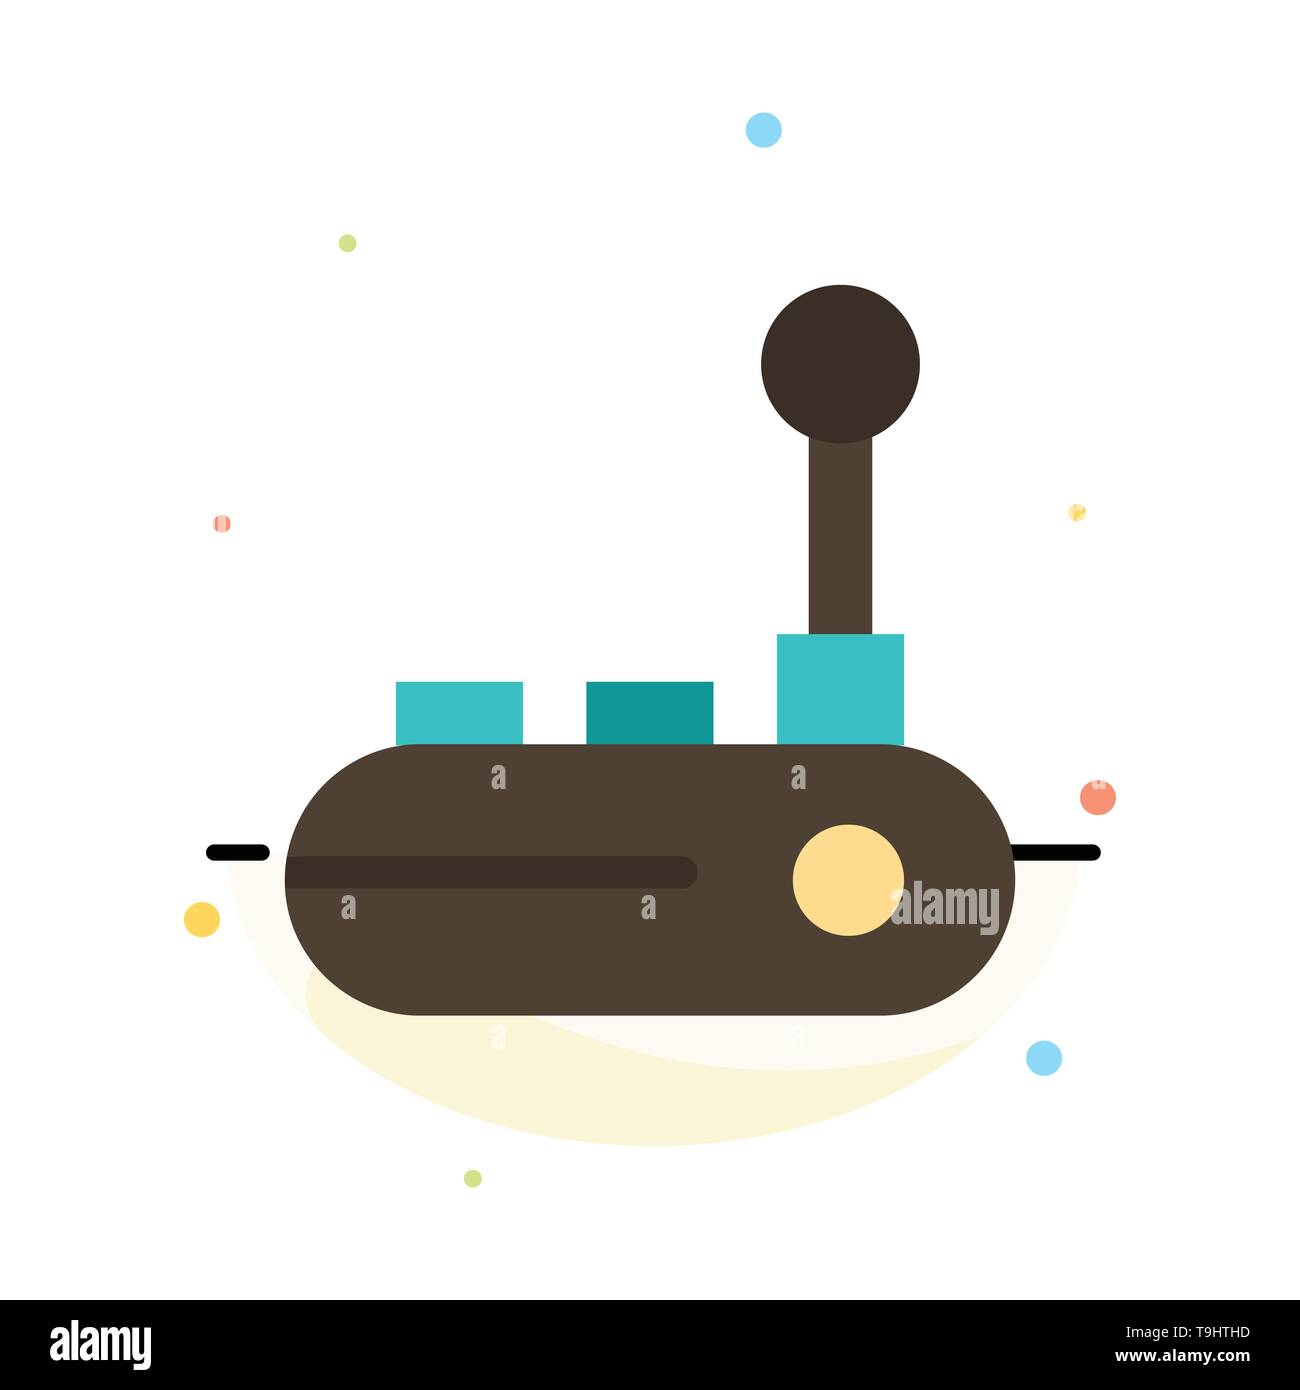 Controller, Joy Pad, Joy Stick, Joy pad Abstract Flat Color Icon Template - Stock Image